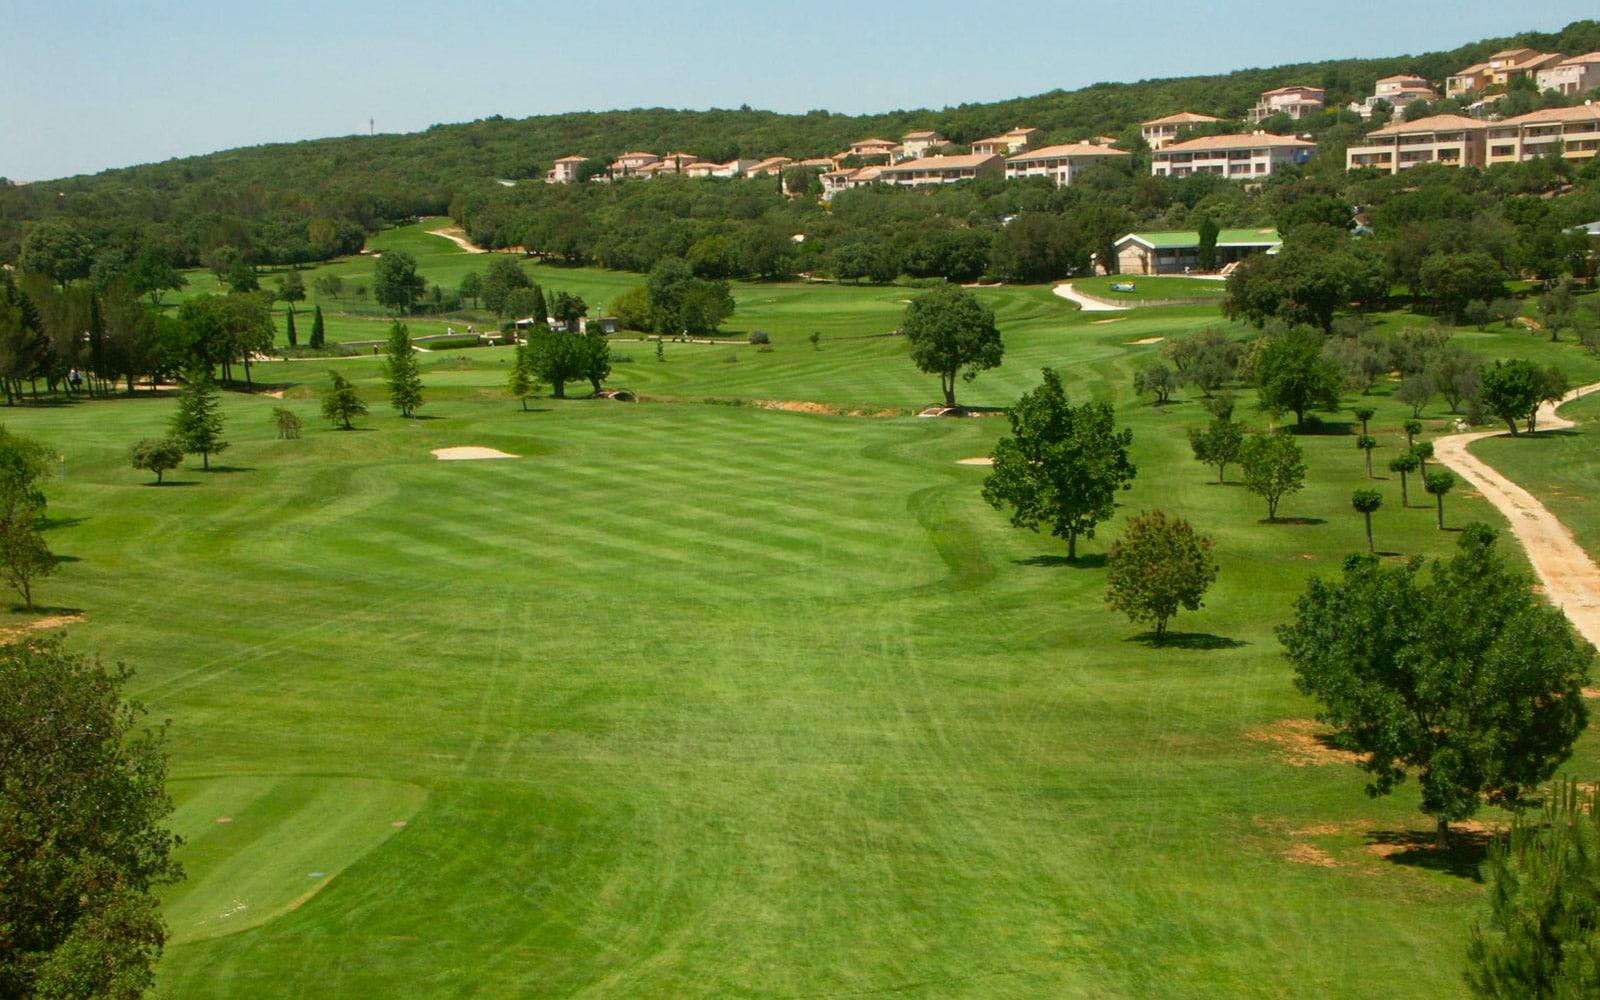 Golf Club de Nîmes Vacquerolles